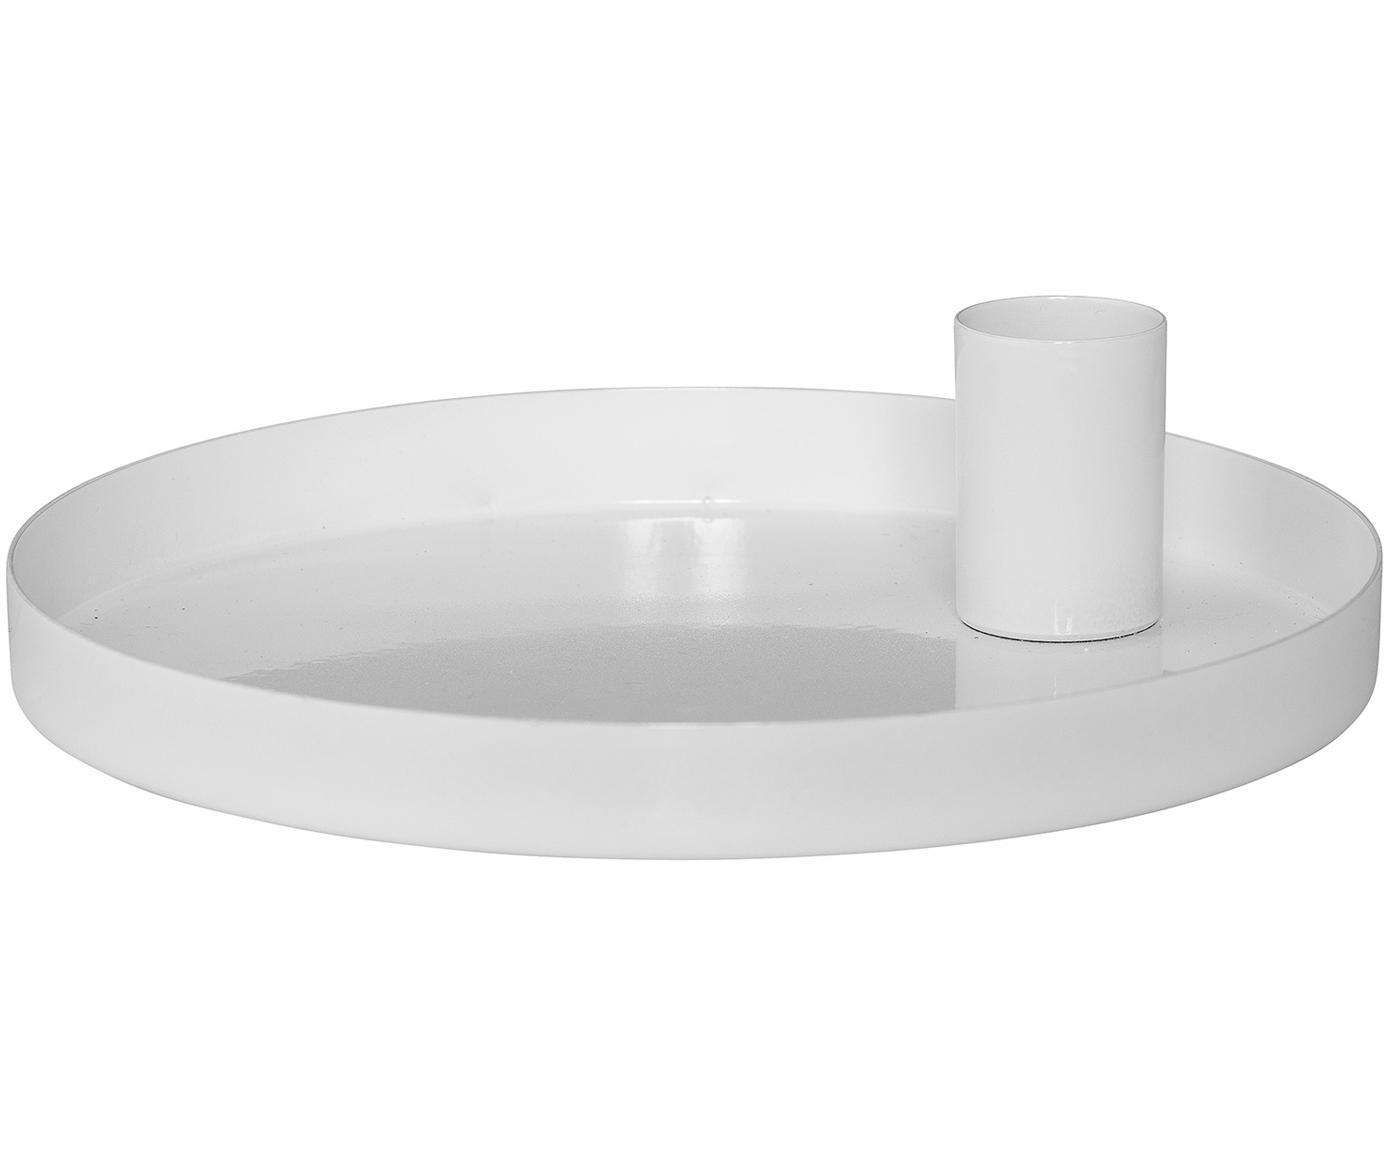 Candelabro Modern, Metal recubierto, Blanco, Ø 15 x Al 4 cm